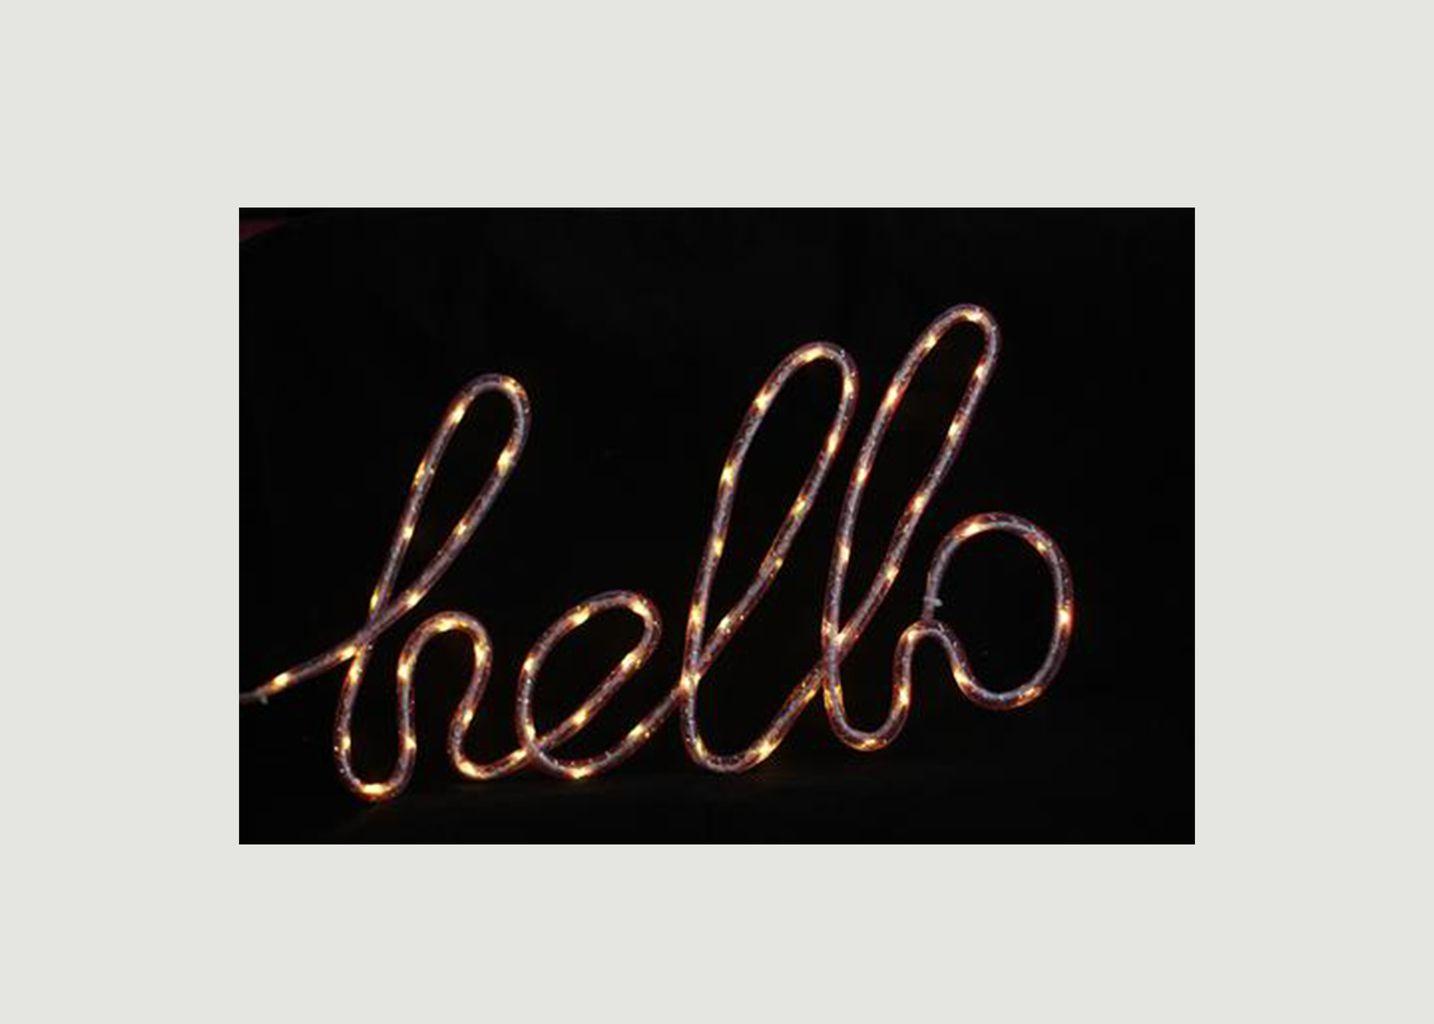 Lampe Nylon Hello - Locomocean